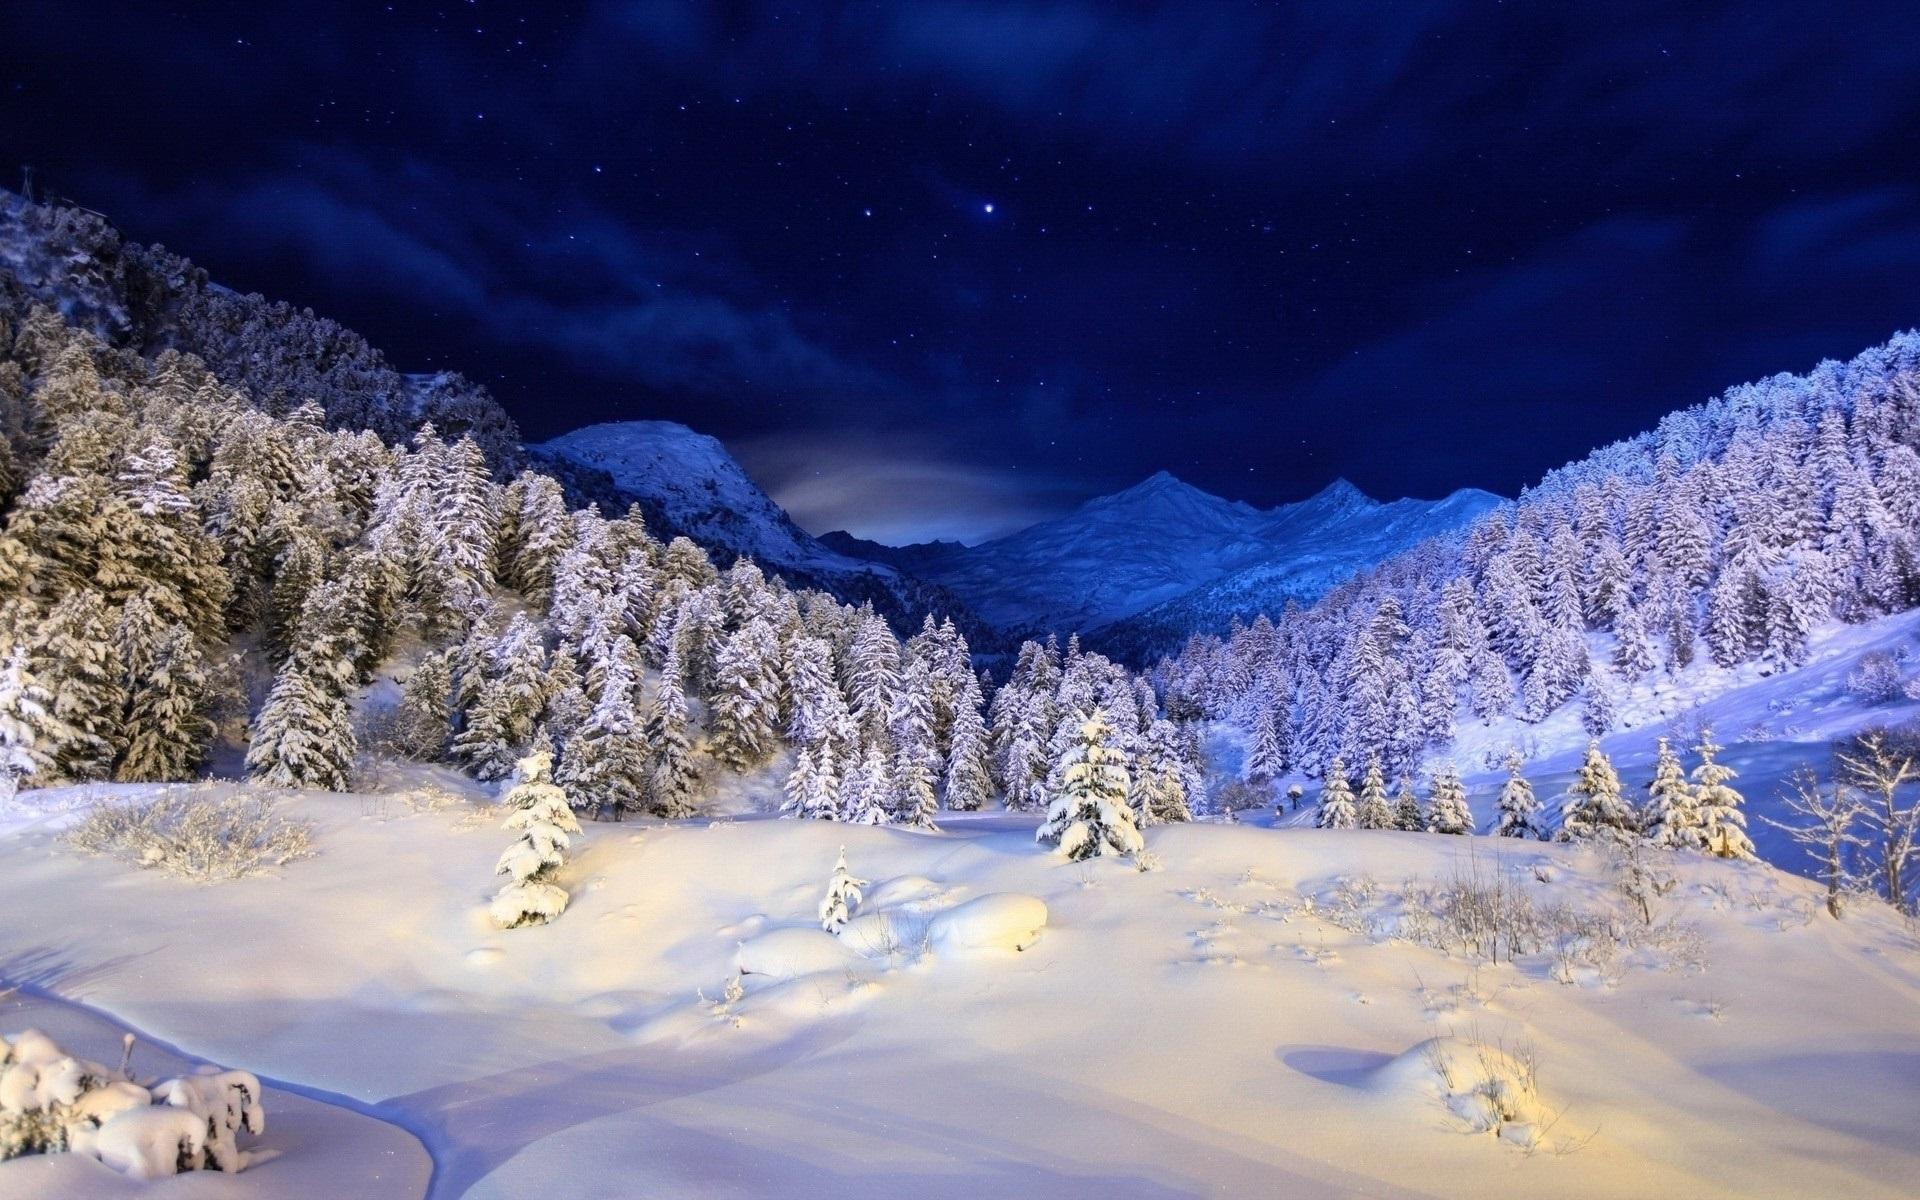 это бои зима картинки надписями пожеланиями